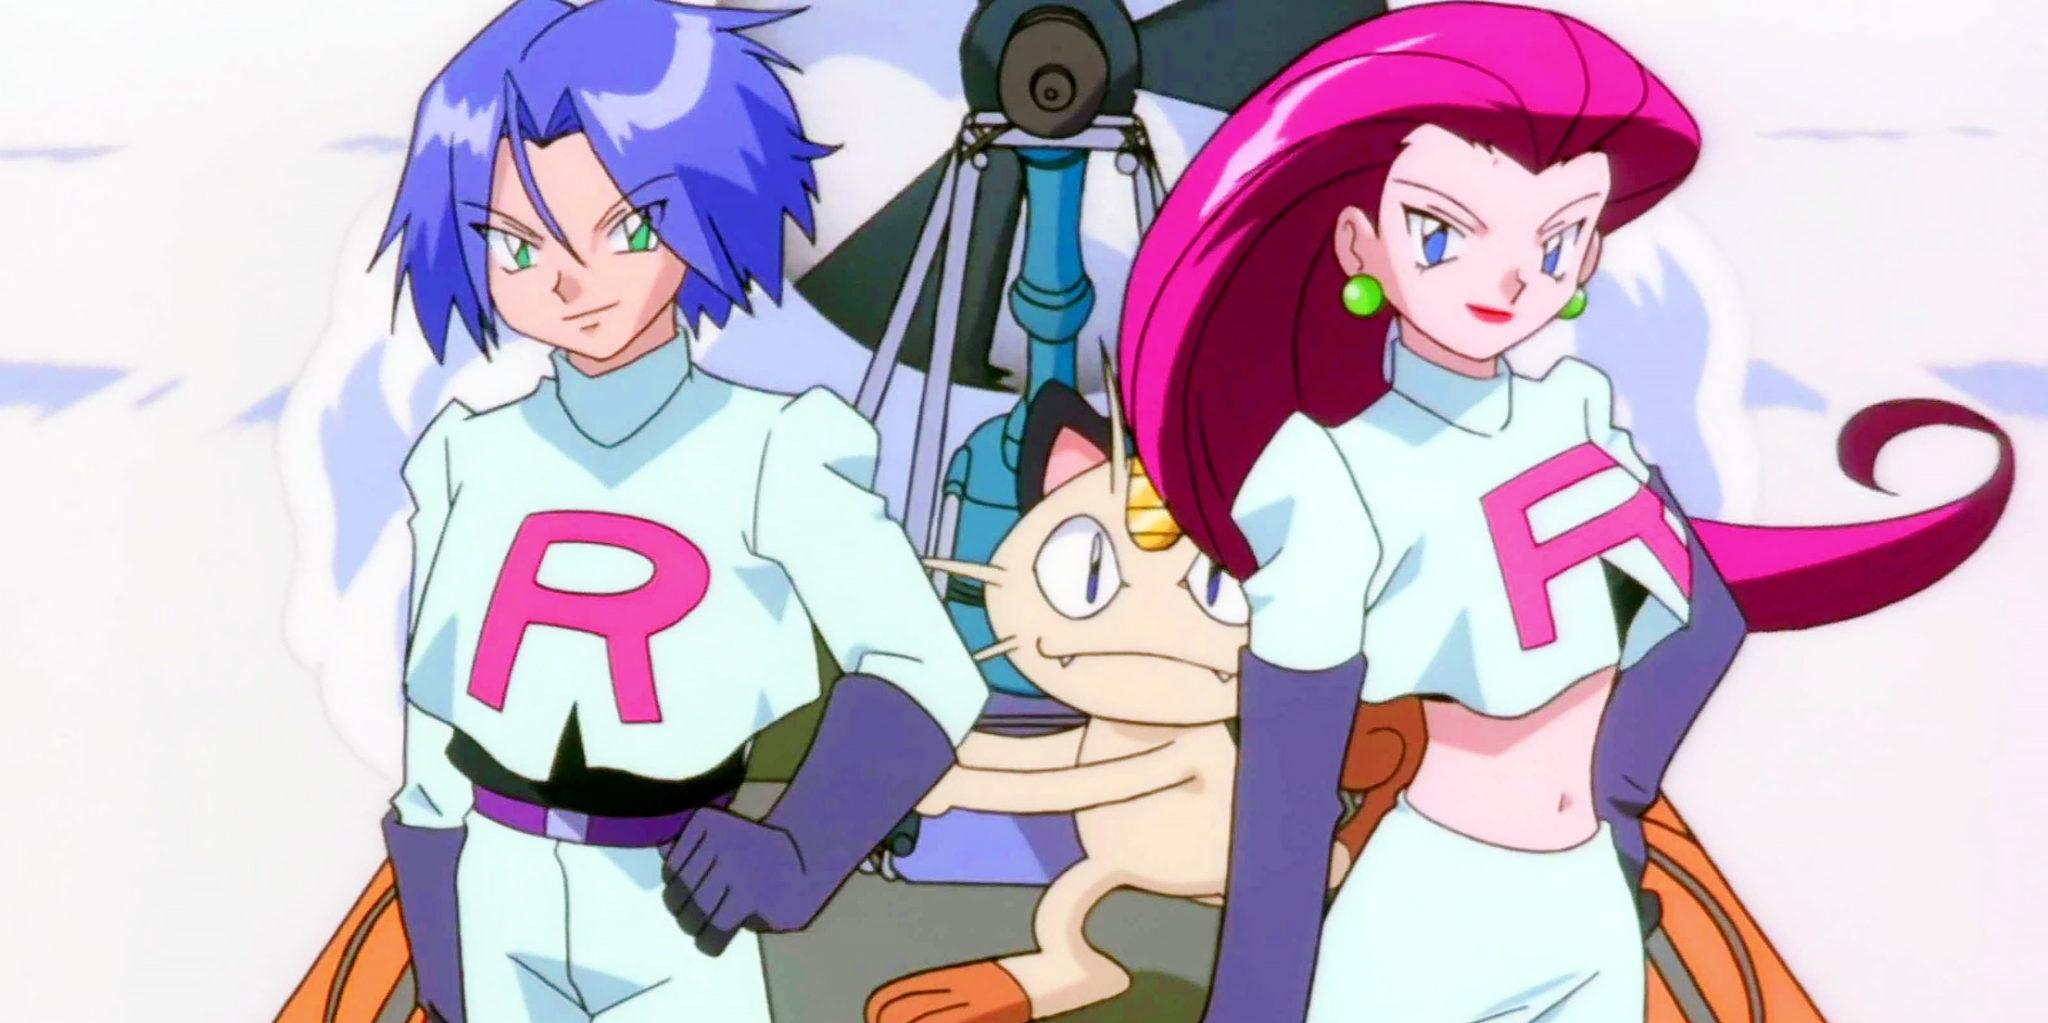 jessie and james in pokemon anime